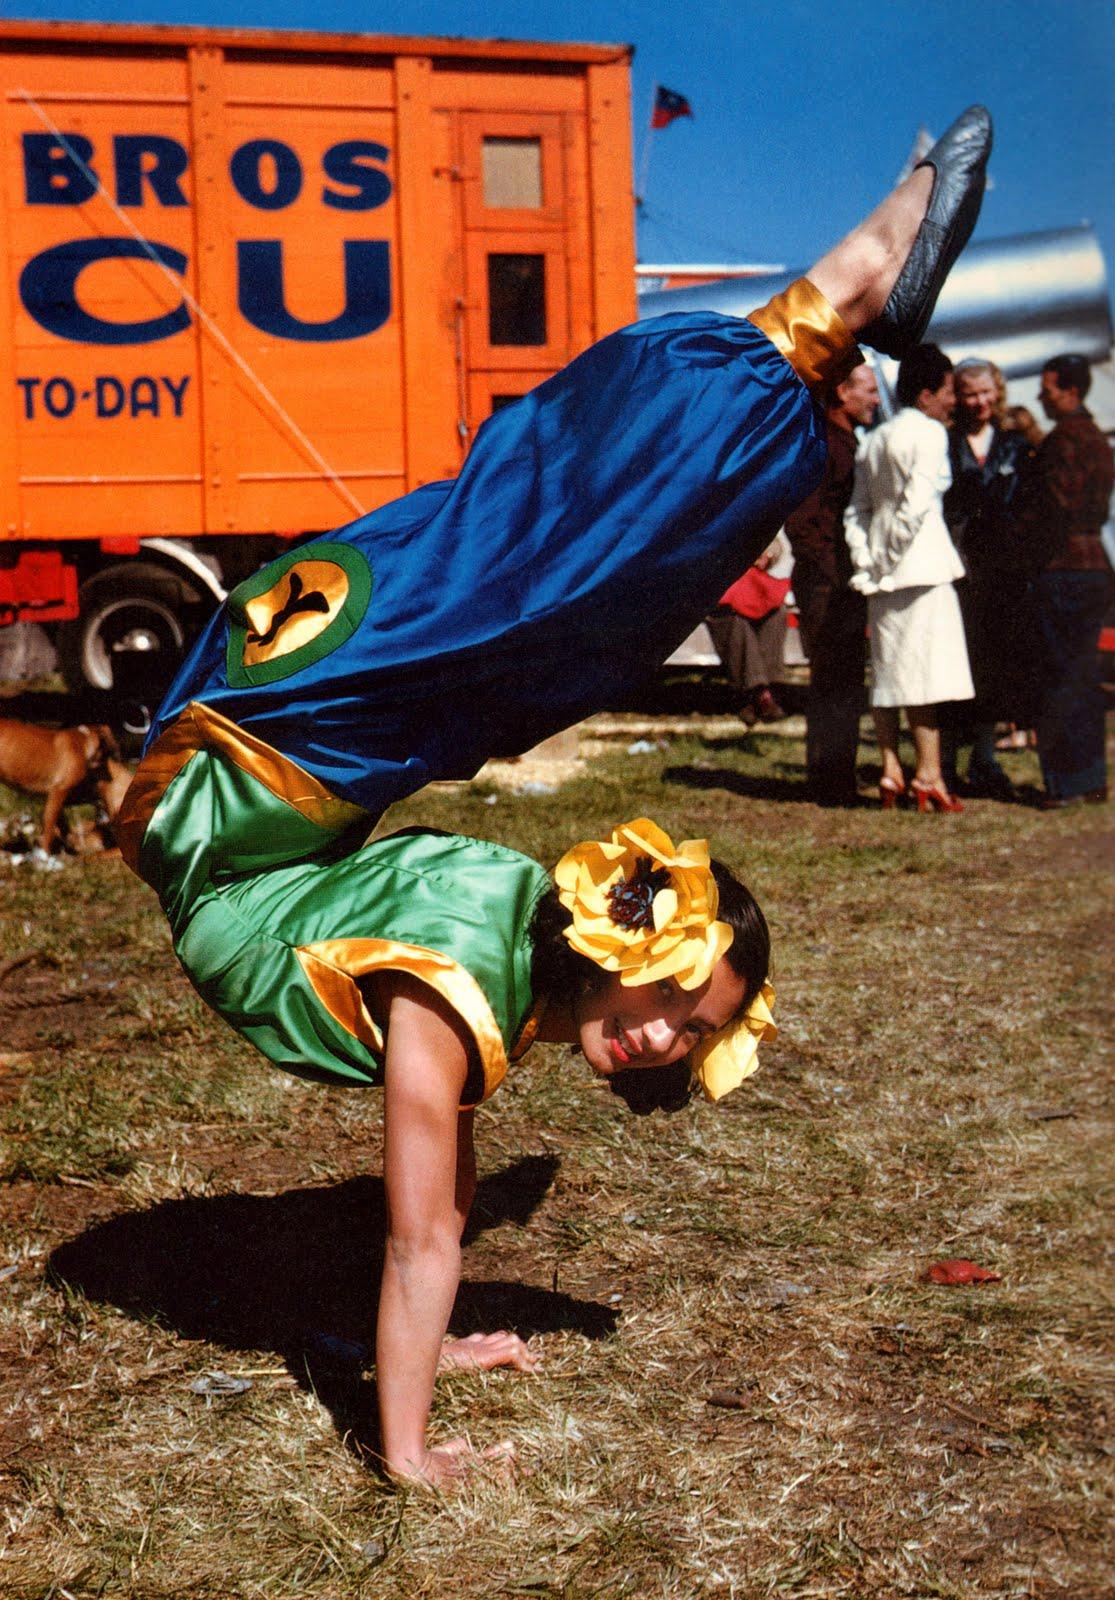 showgirl-circus-girl-1950s